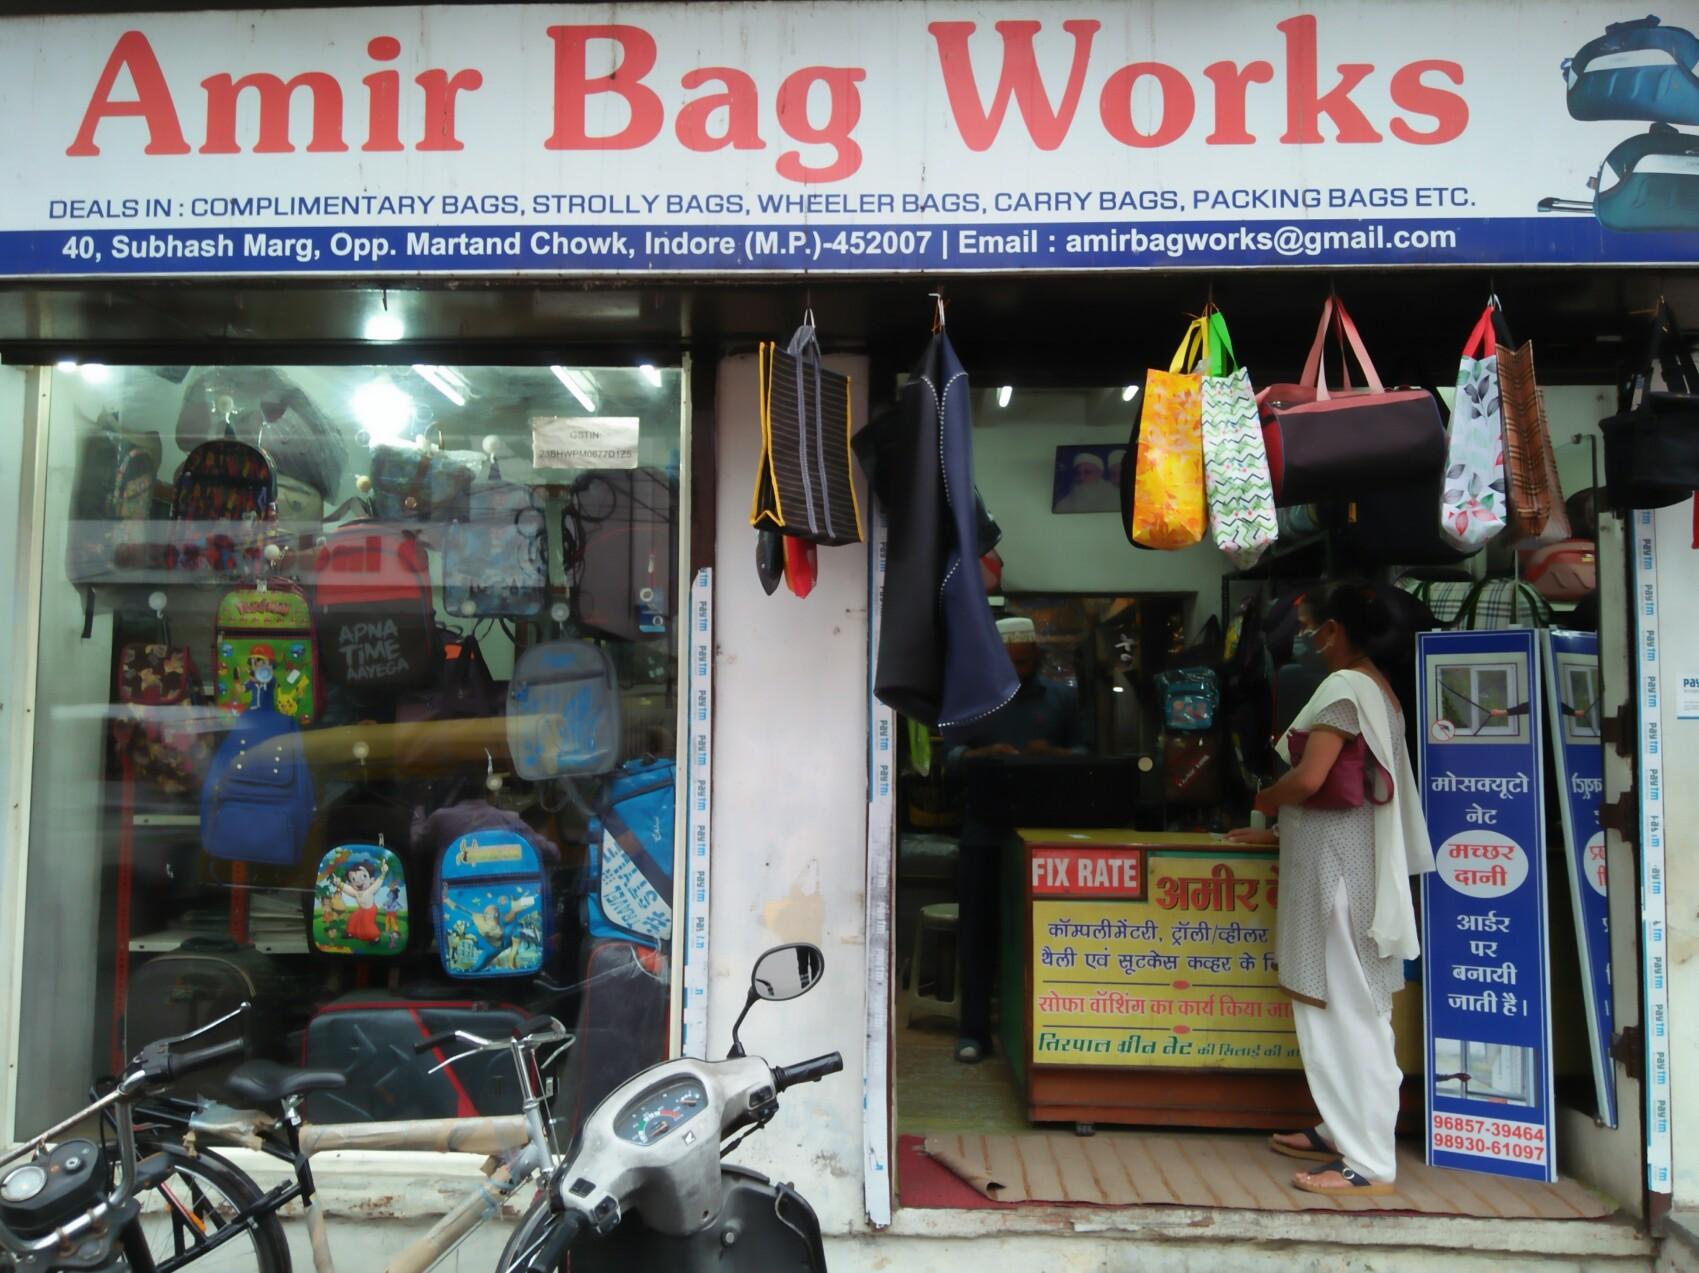 Amir bag works